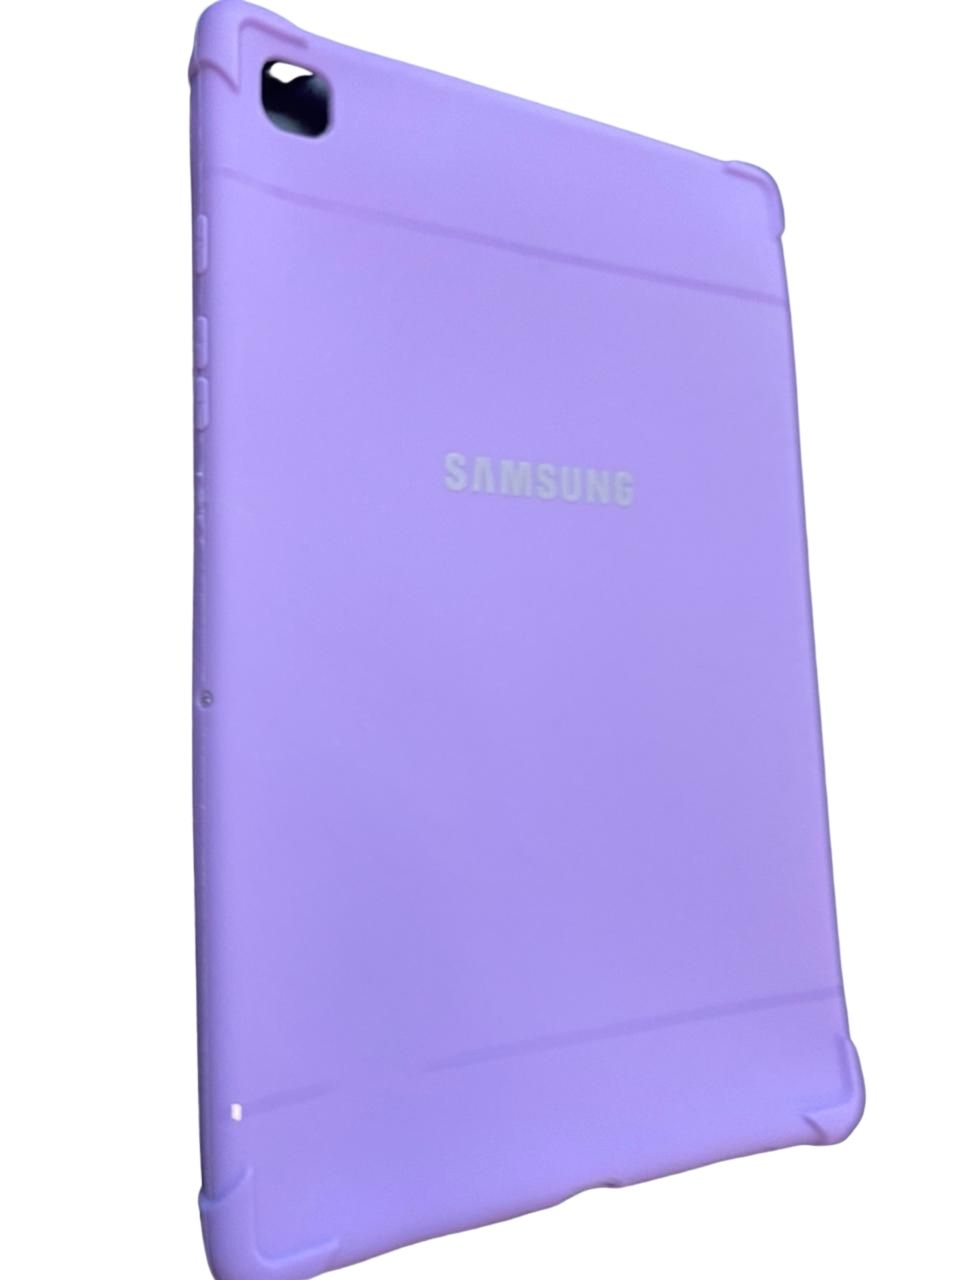 Capa Tablet Samsung Galaxy Tab A7 10.4 T500 T505 Tpu Silicone Roxa